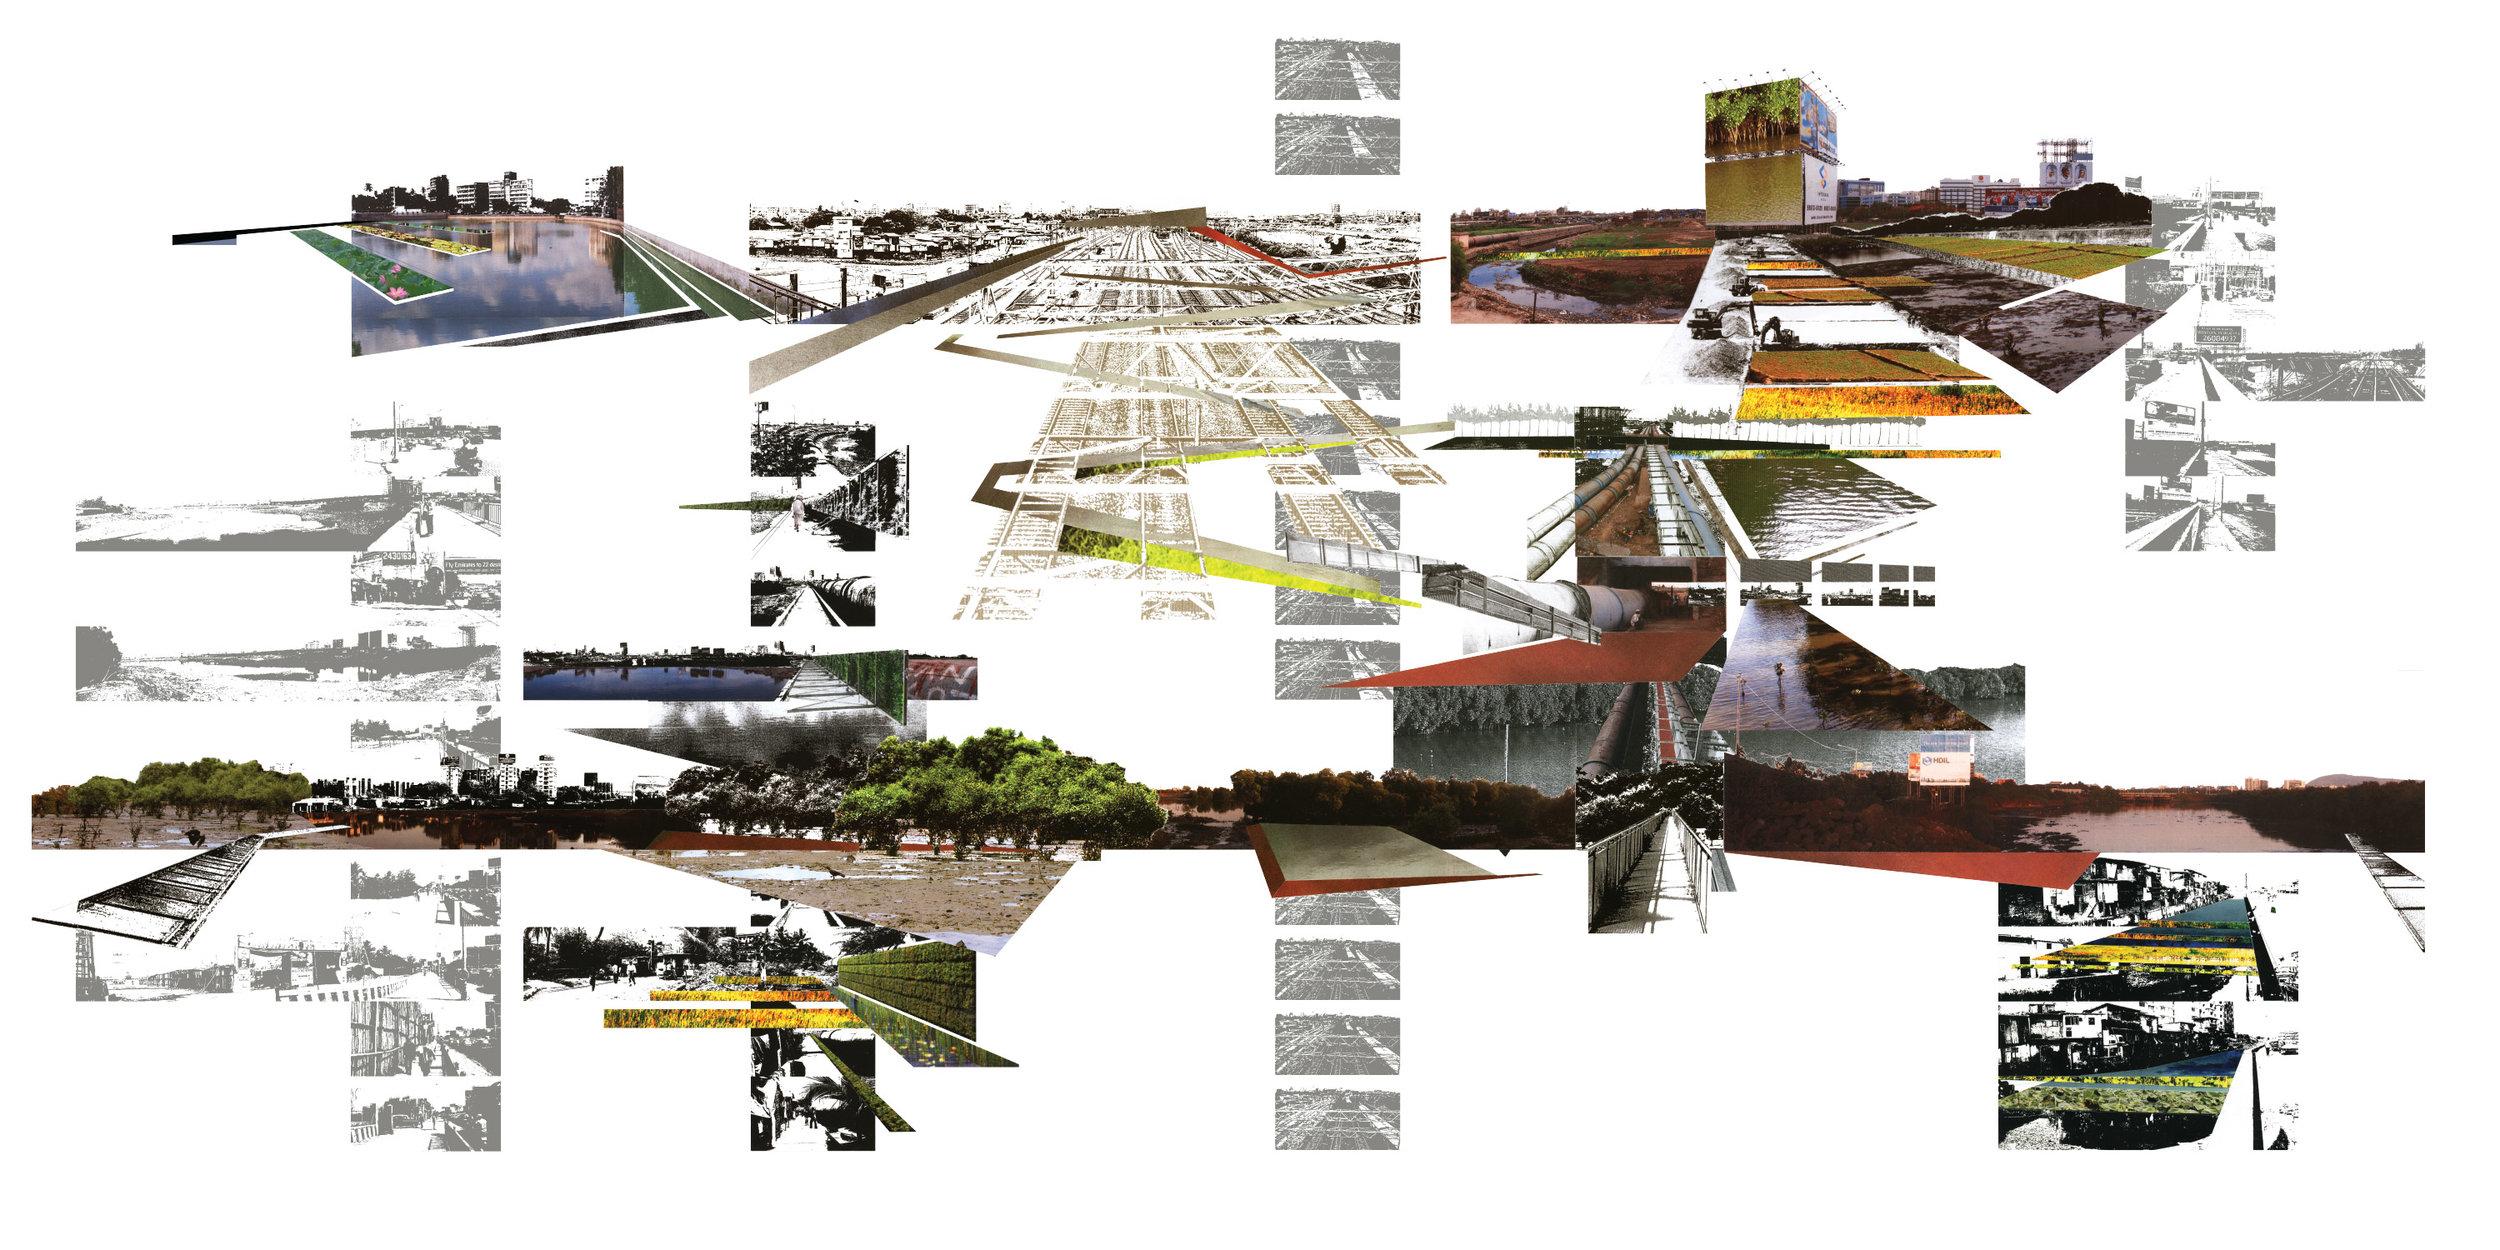 mahim-crossing_perspective_layers-1&2.jpg